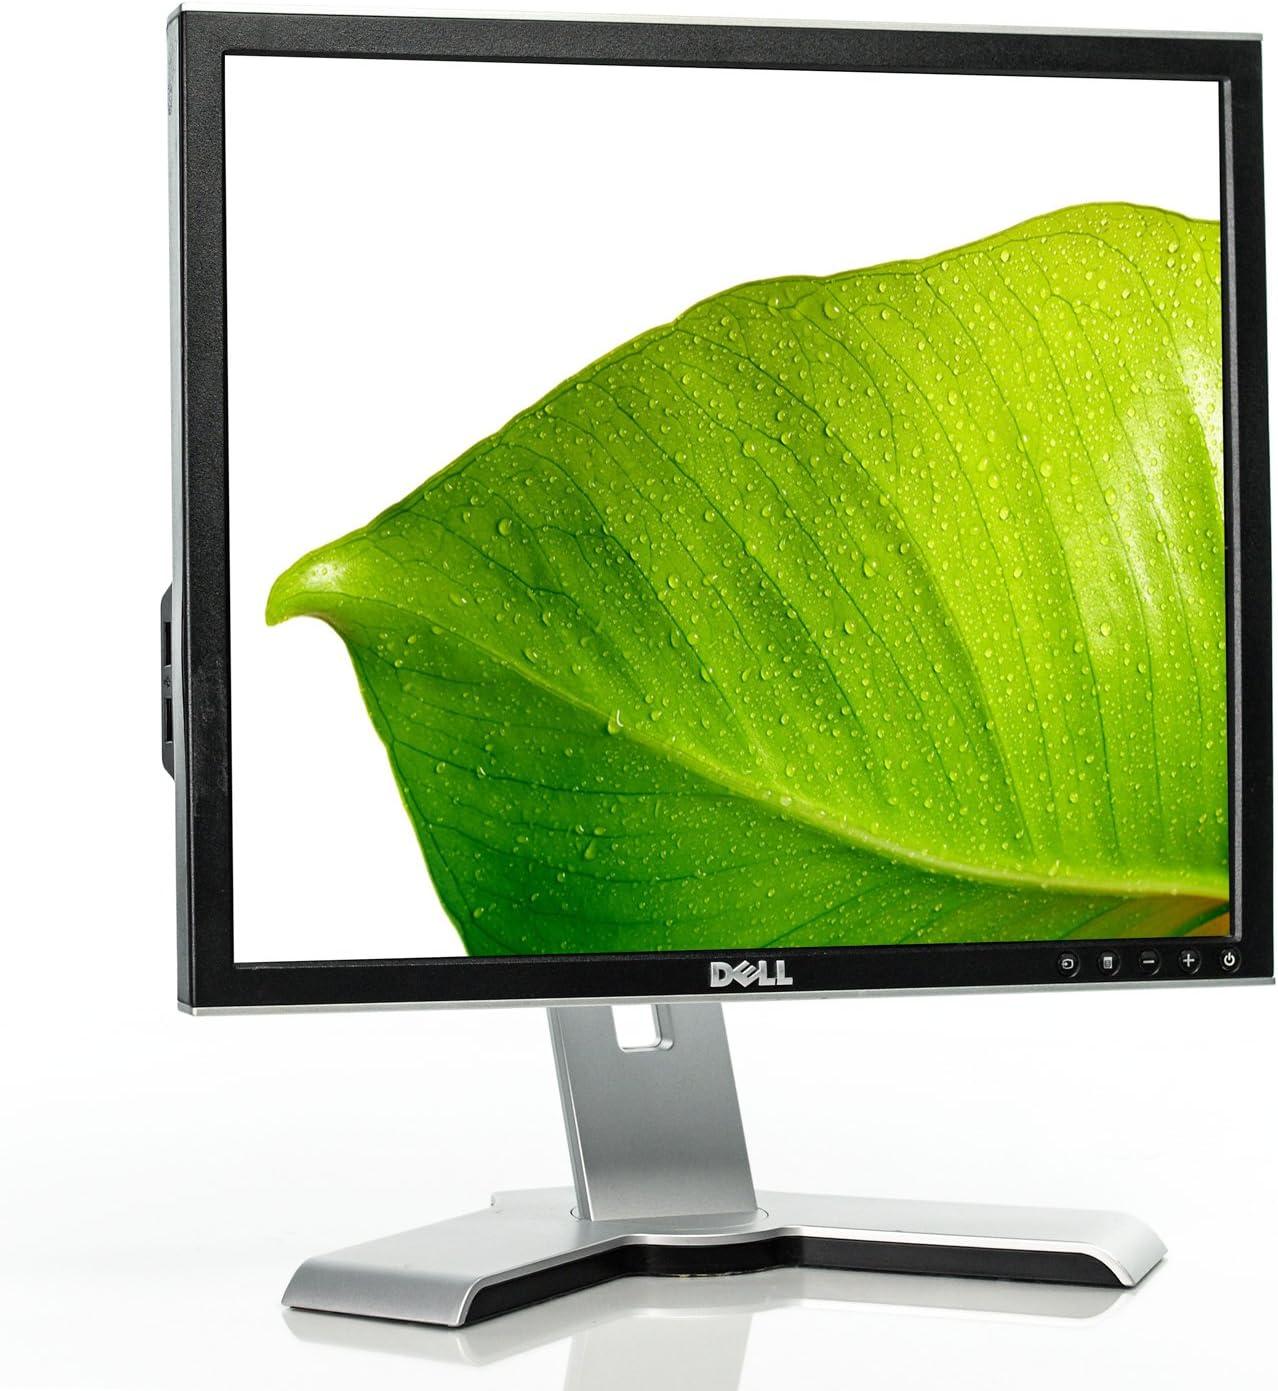 "Dell Ultrasharp 1907FP 19"" LCD Flat Panel Monitor"